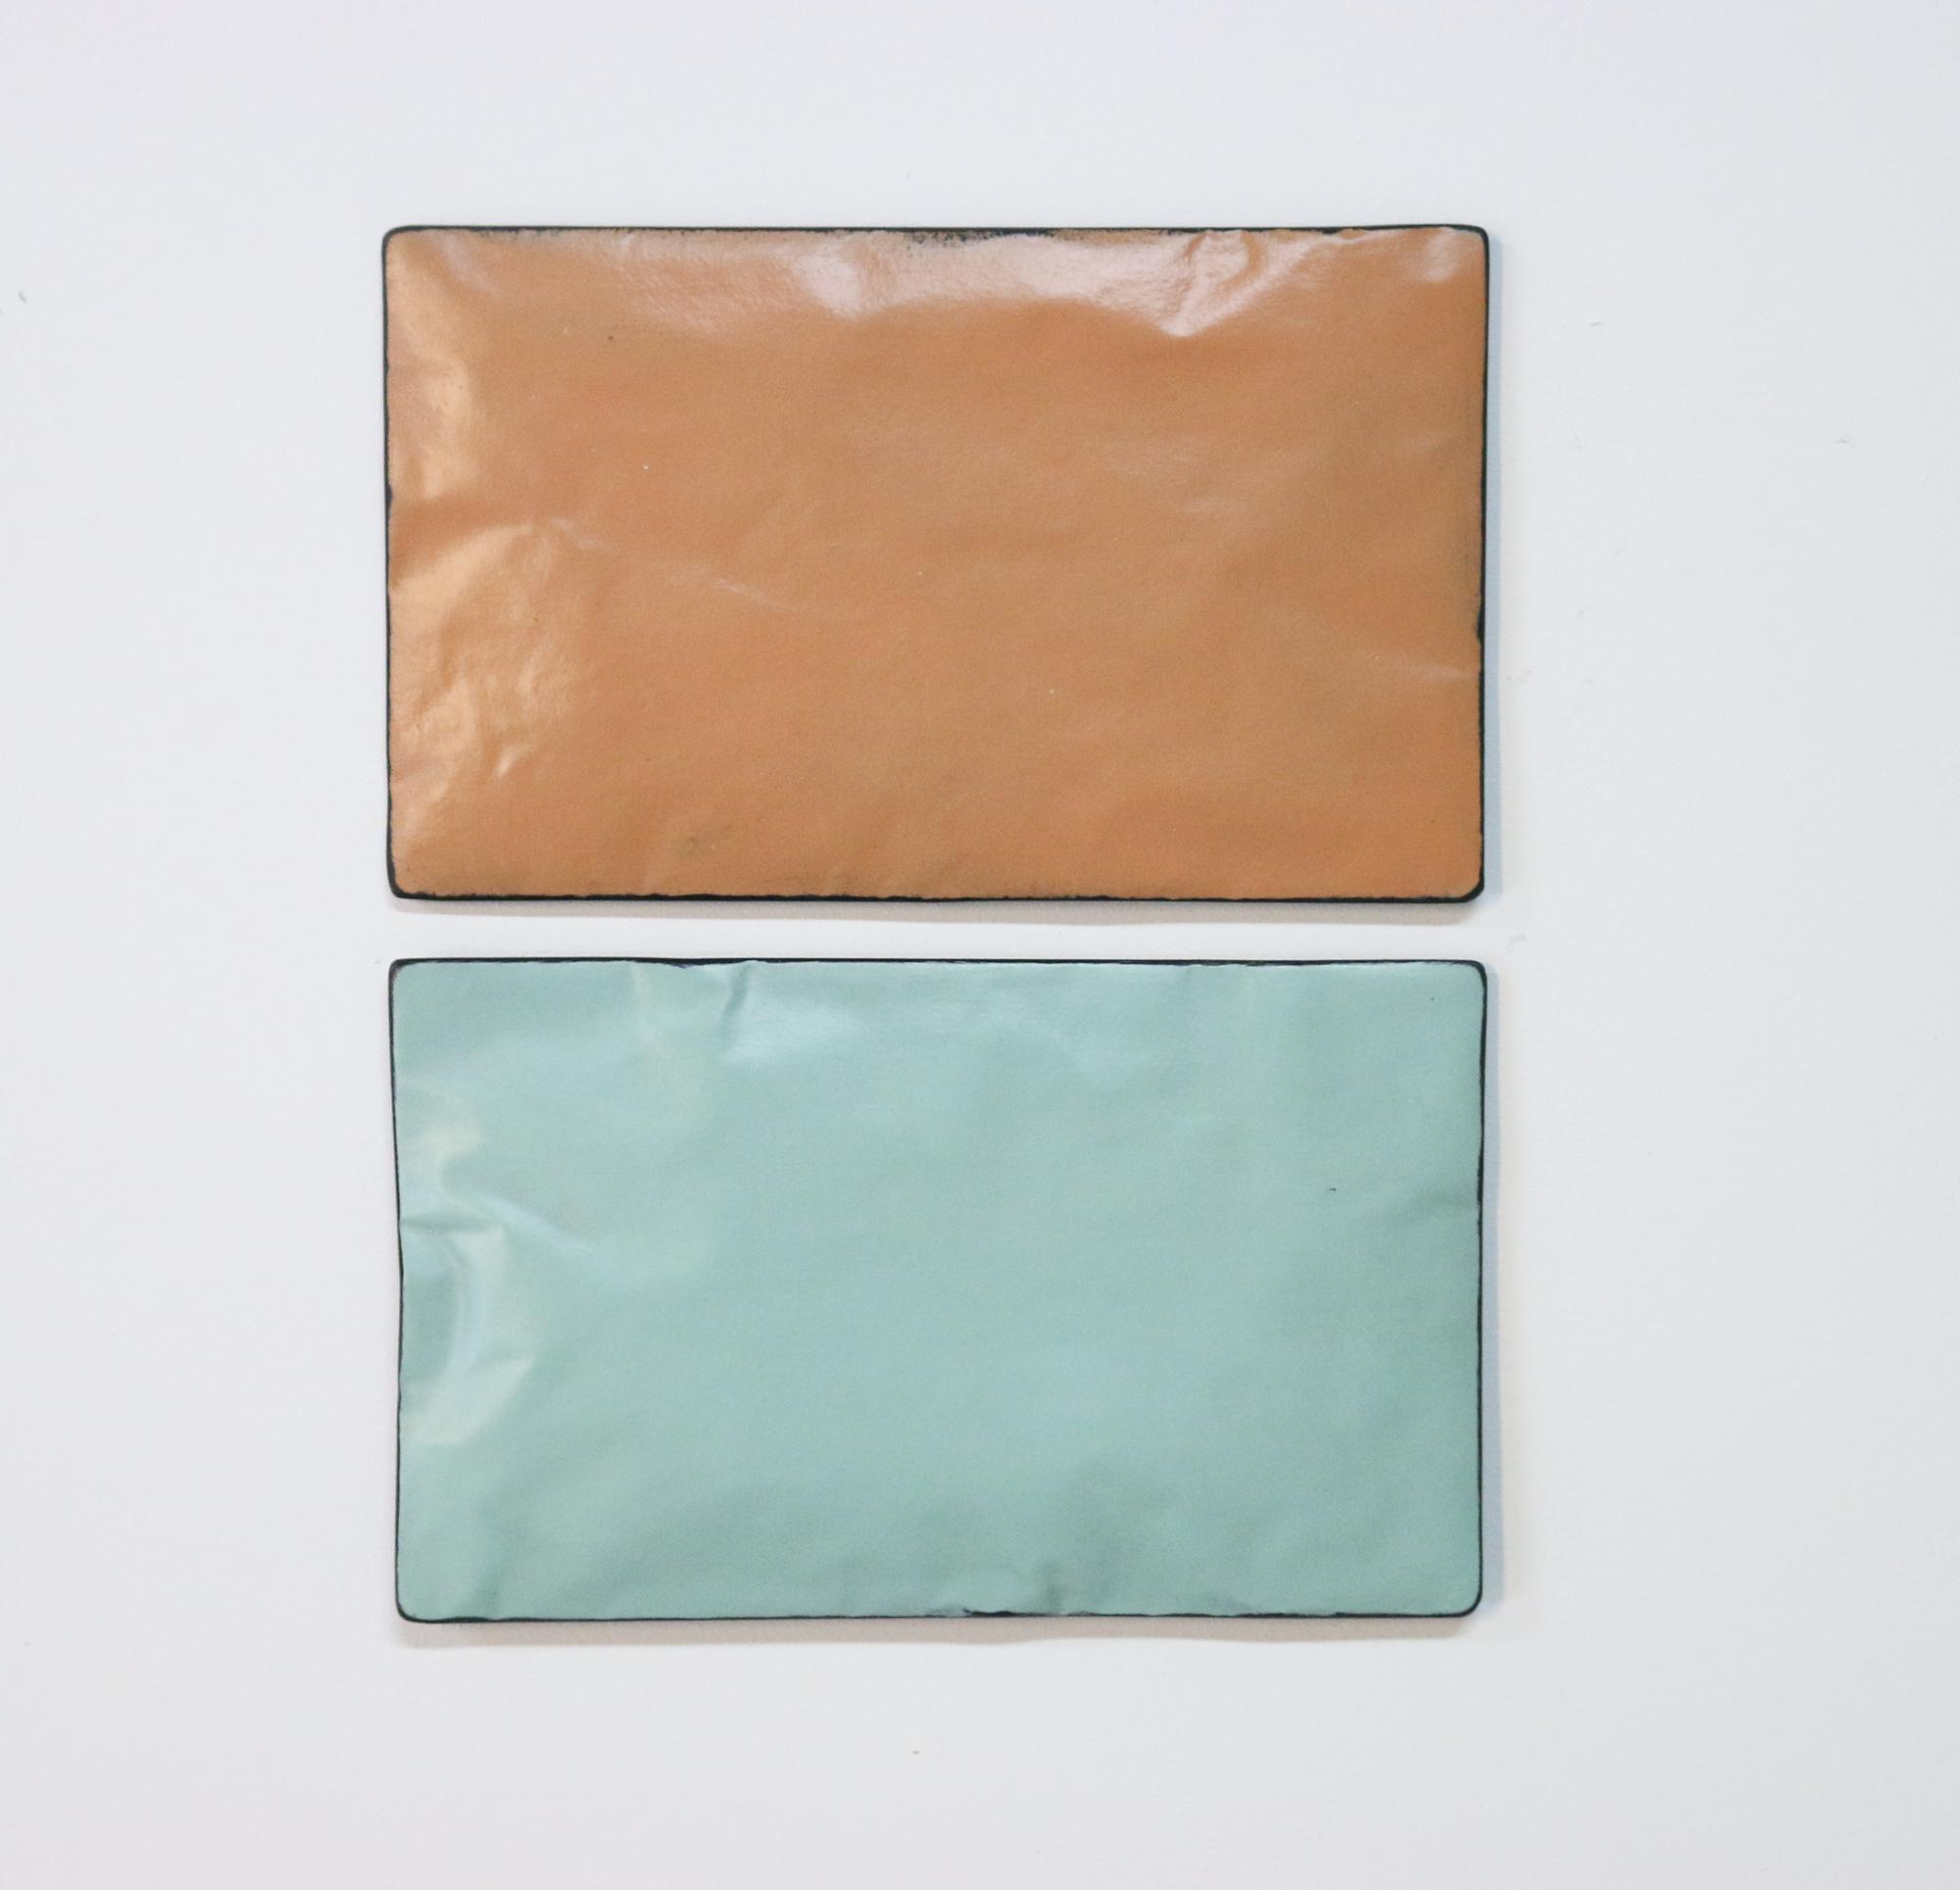 Johan De Wit, Untitled, 2018, Paper, Resin, Marble, Acrylic, 24.5 x 31 cm(2 pces), Affinity Art